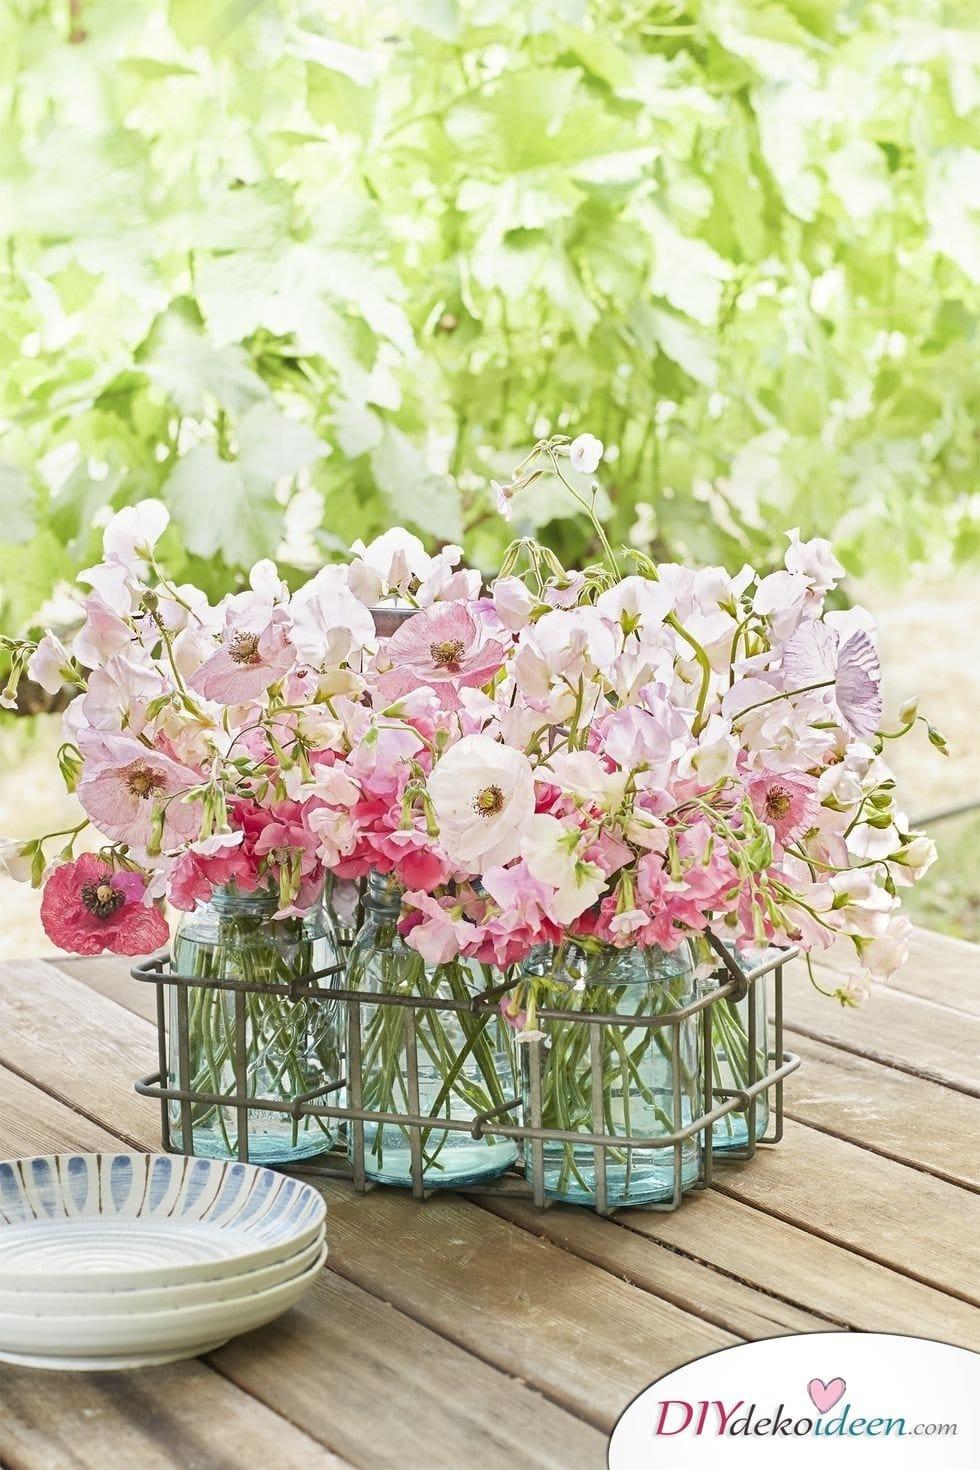 Zauberhafte Diy Dekoideen Fur Fruhlingstischdeko Mit Blumen